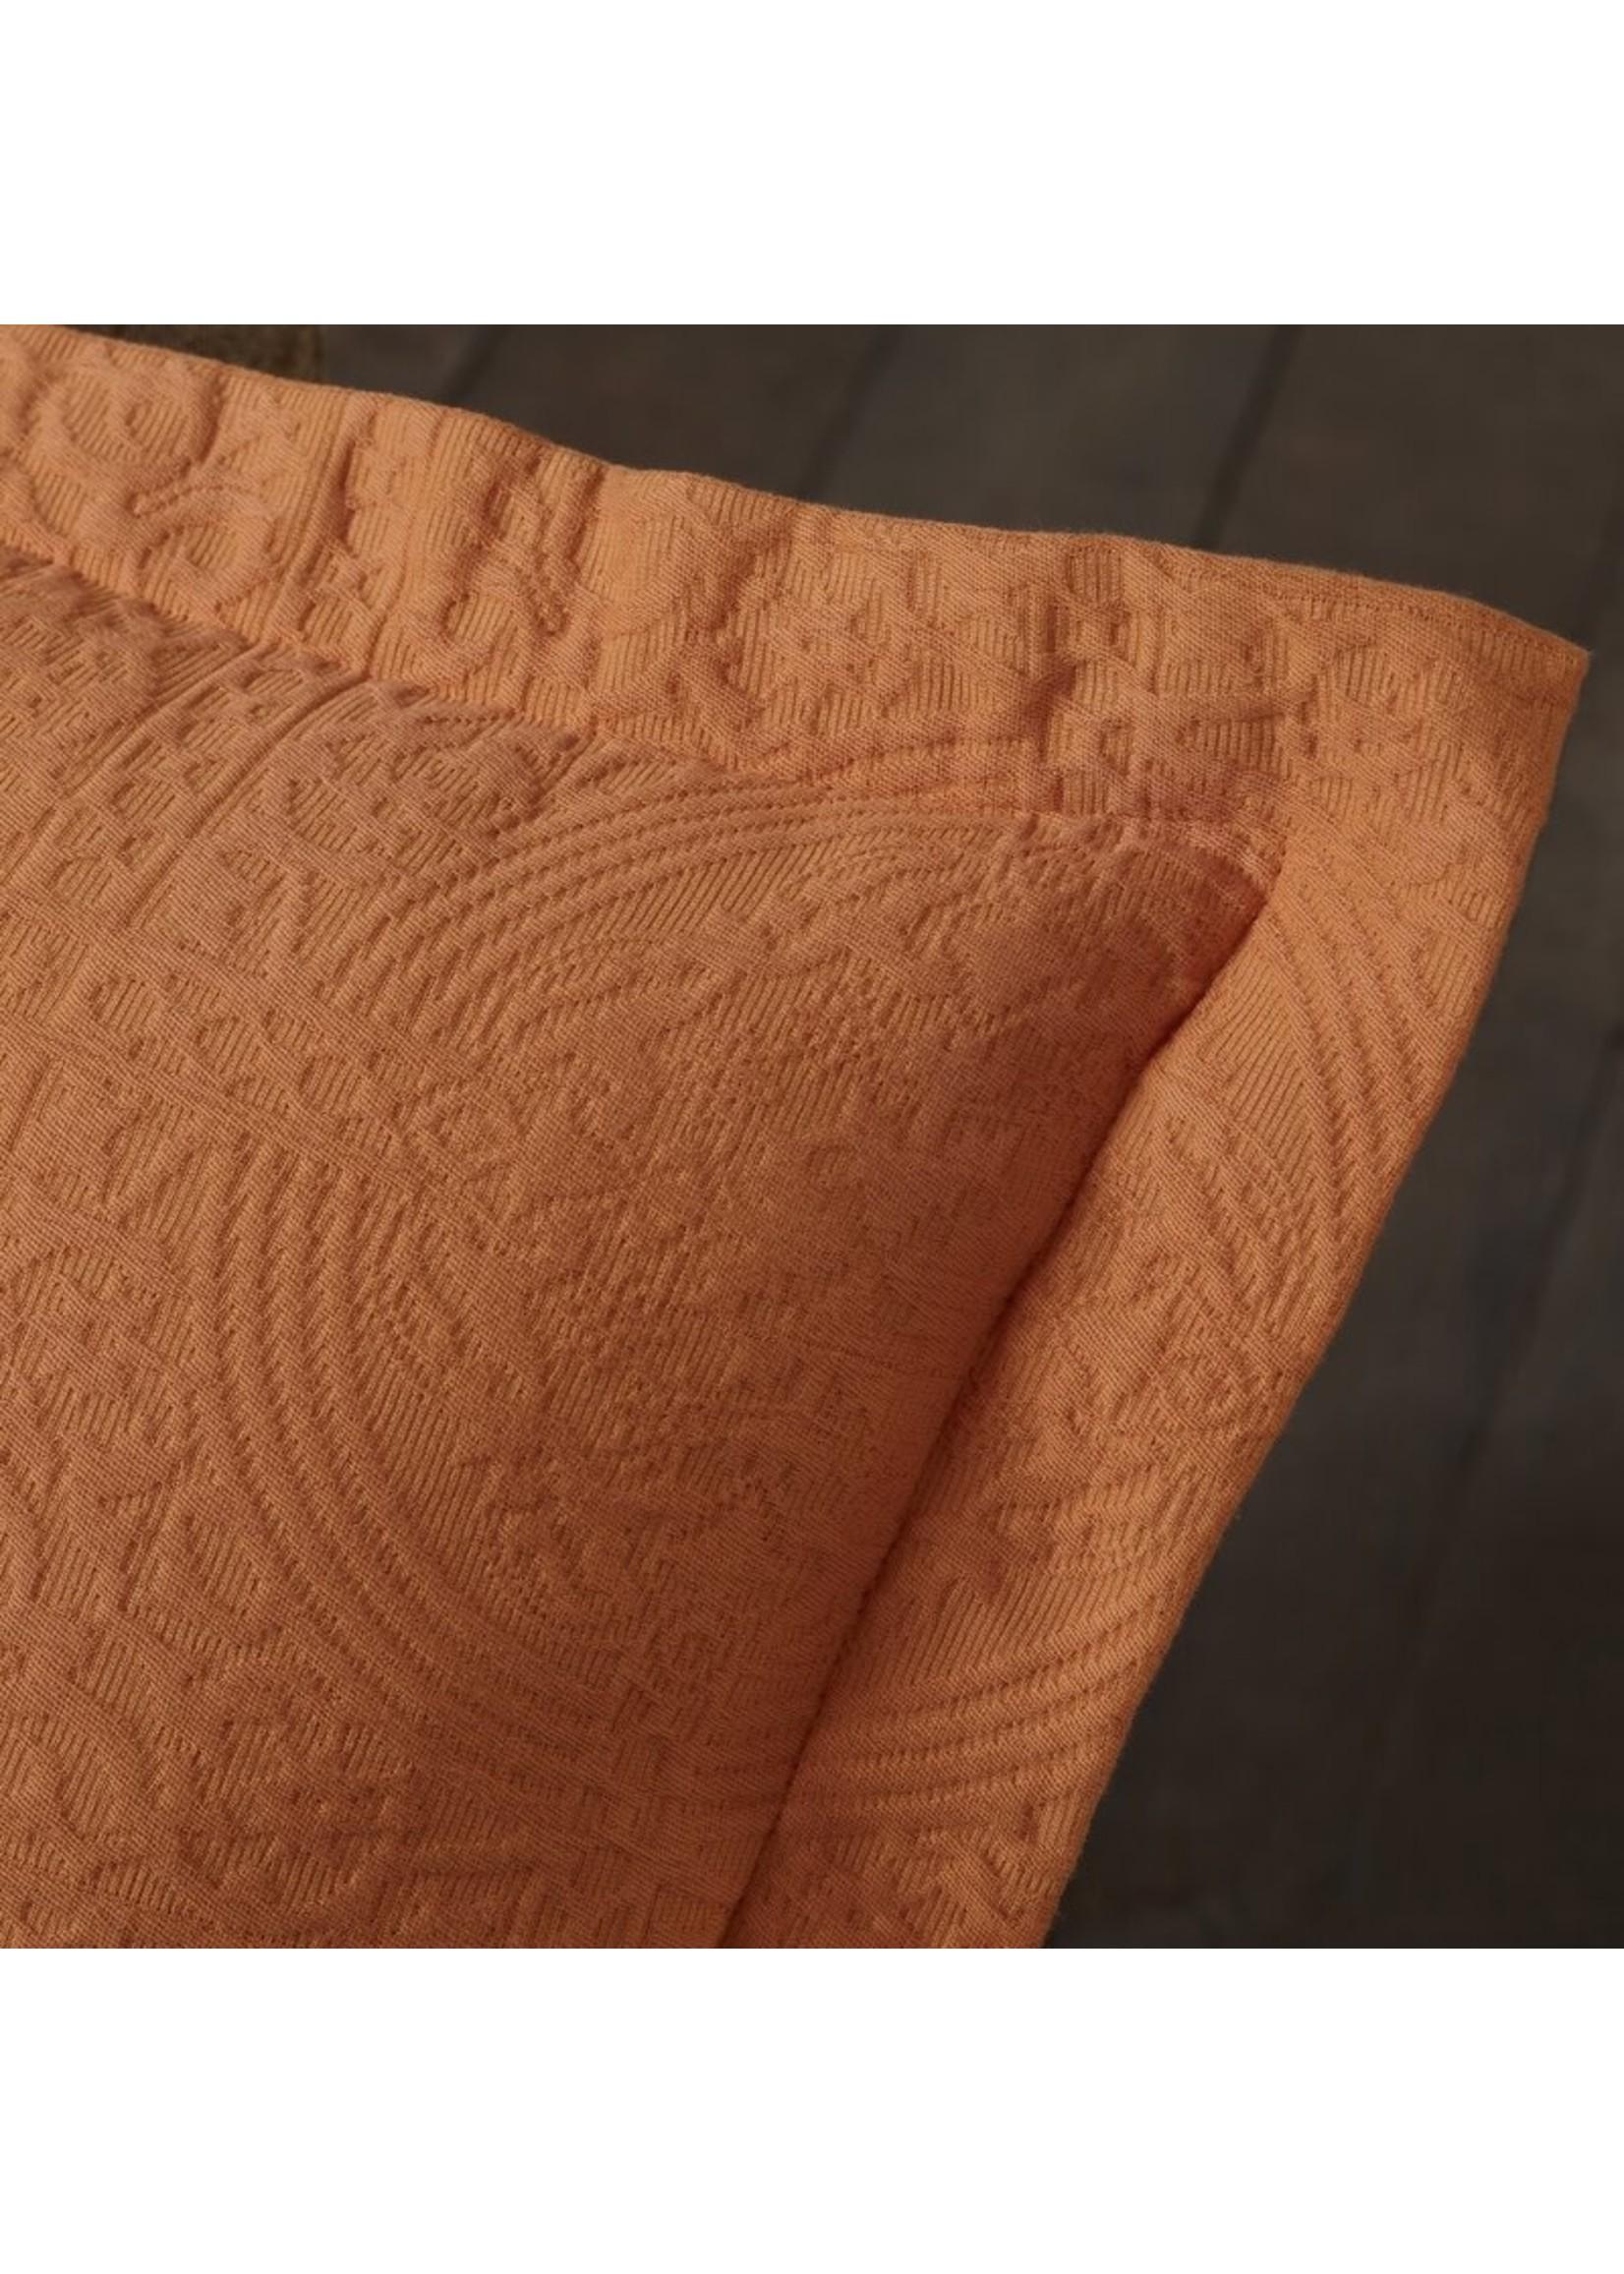 *Twin - Mandalay Oversized Coverlet Set - Final Sale